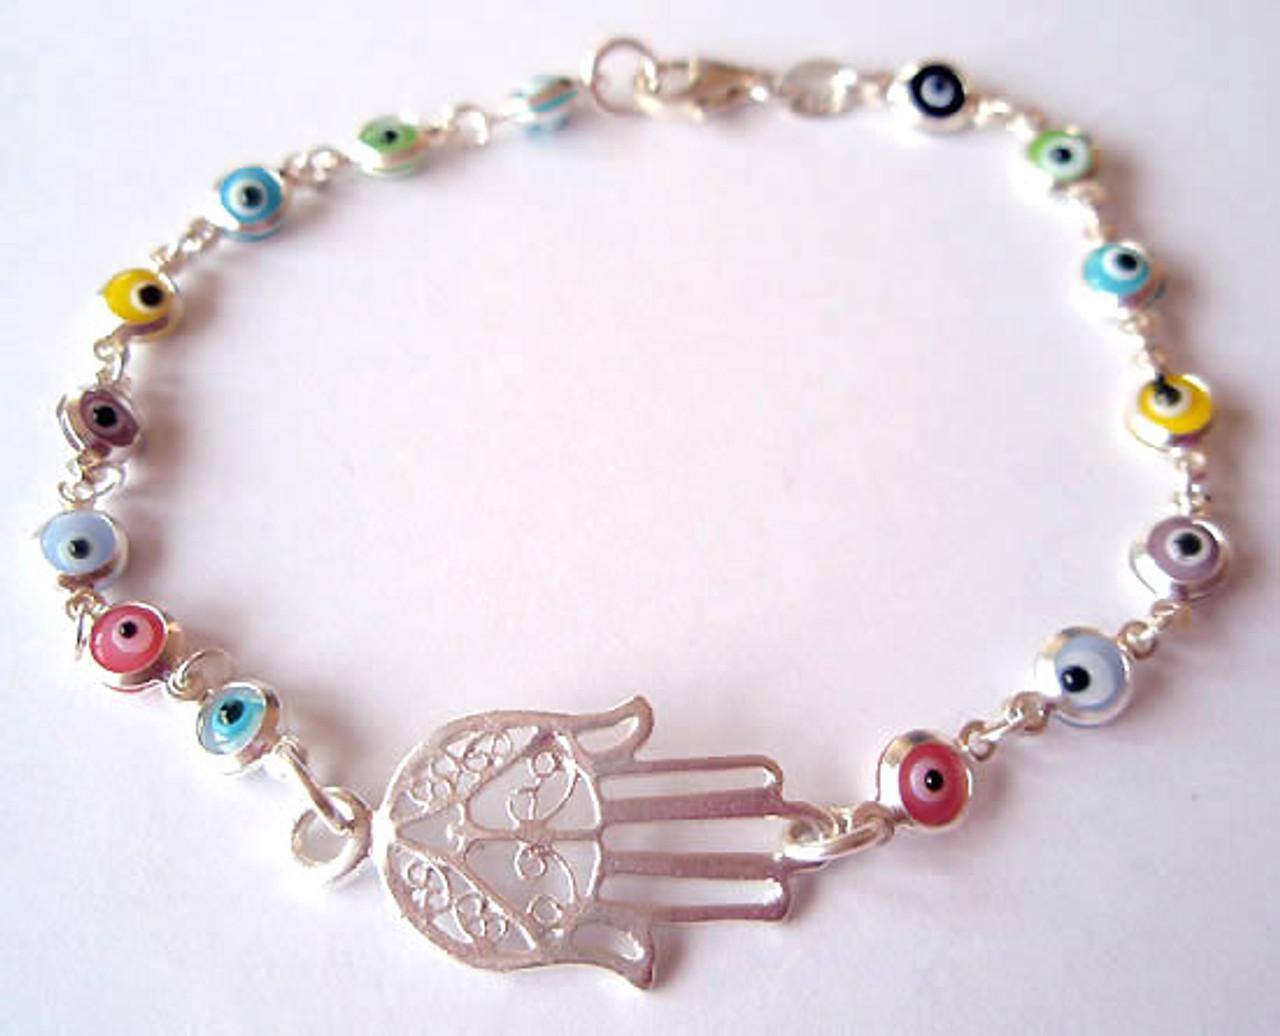 Silver Hamsa Hand Bracelet With Evil Eyes